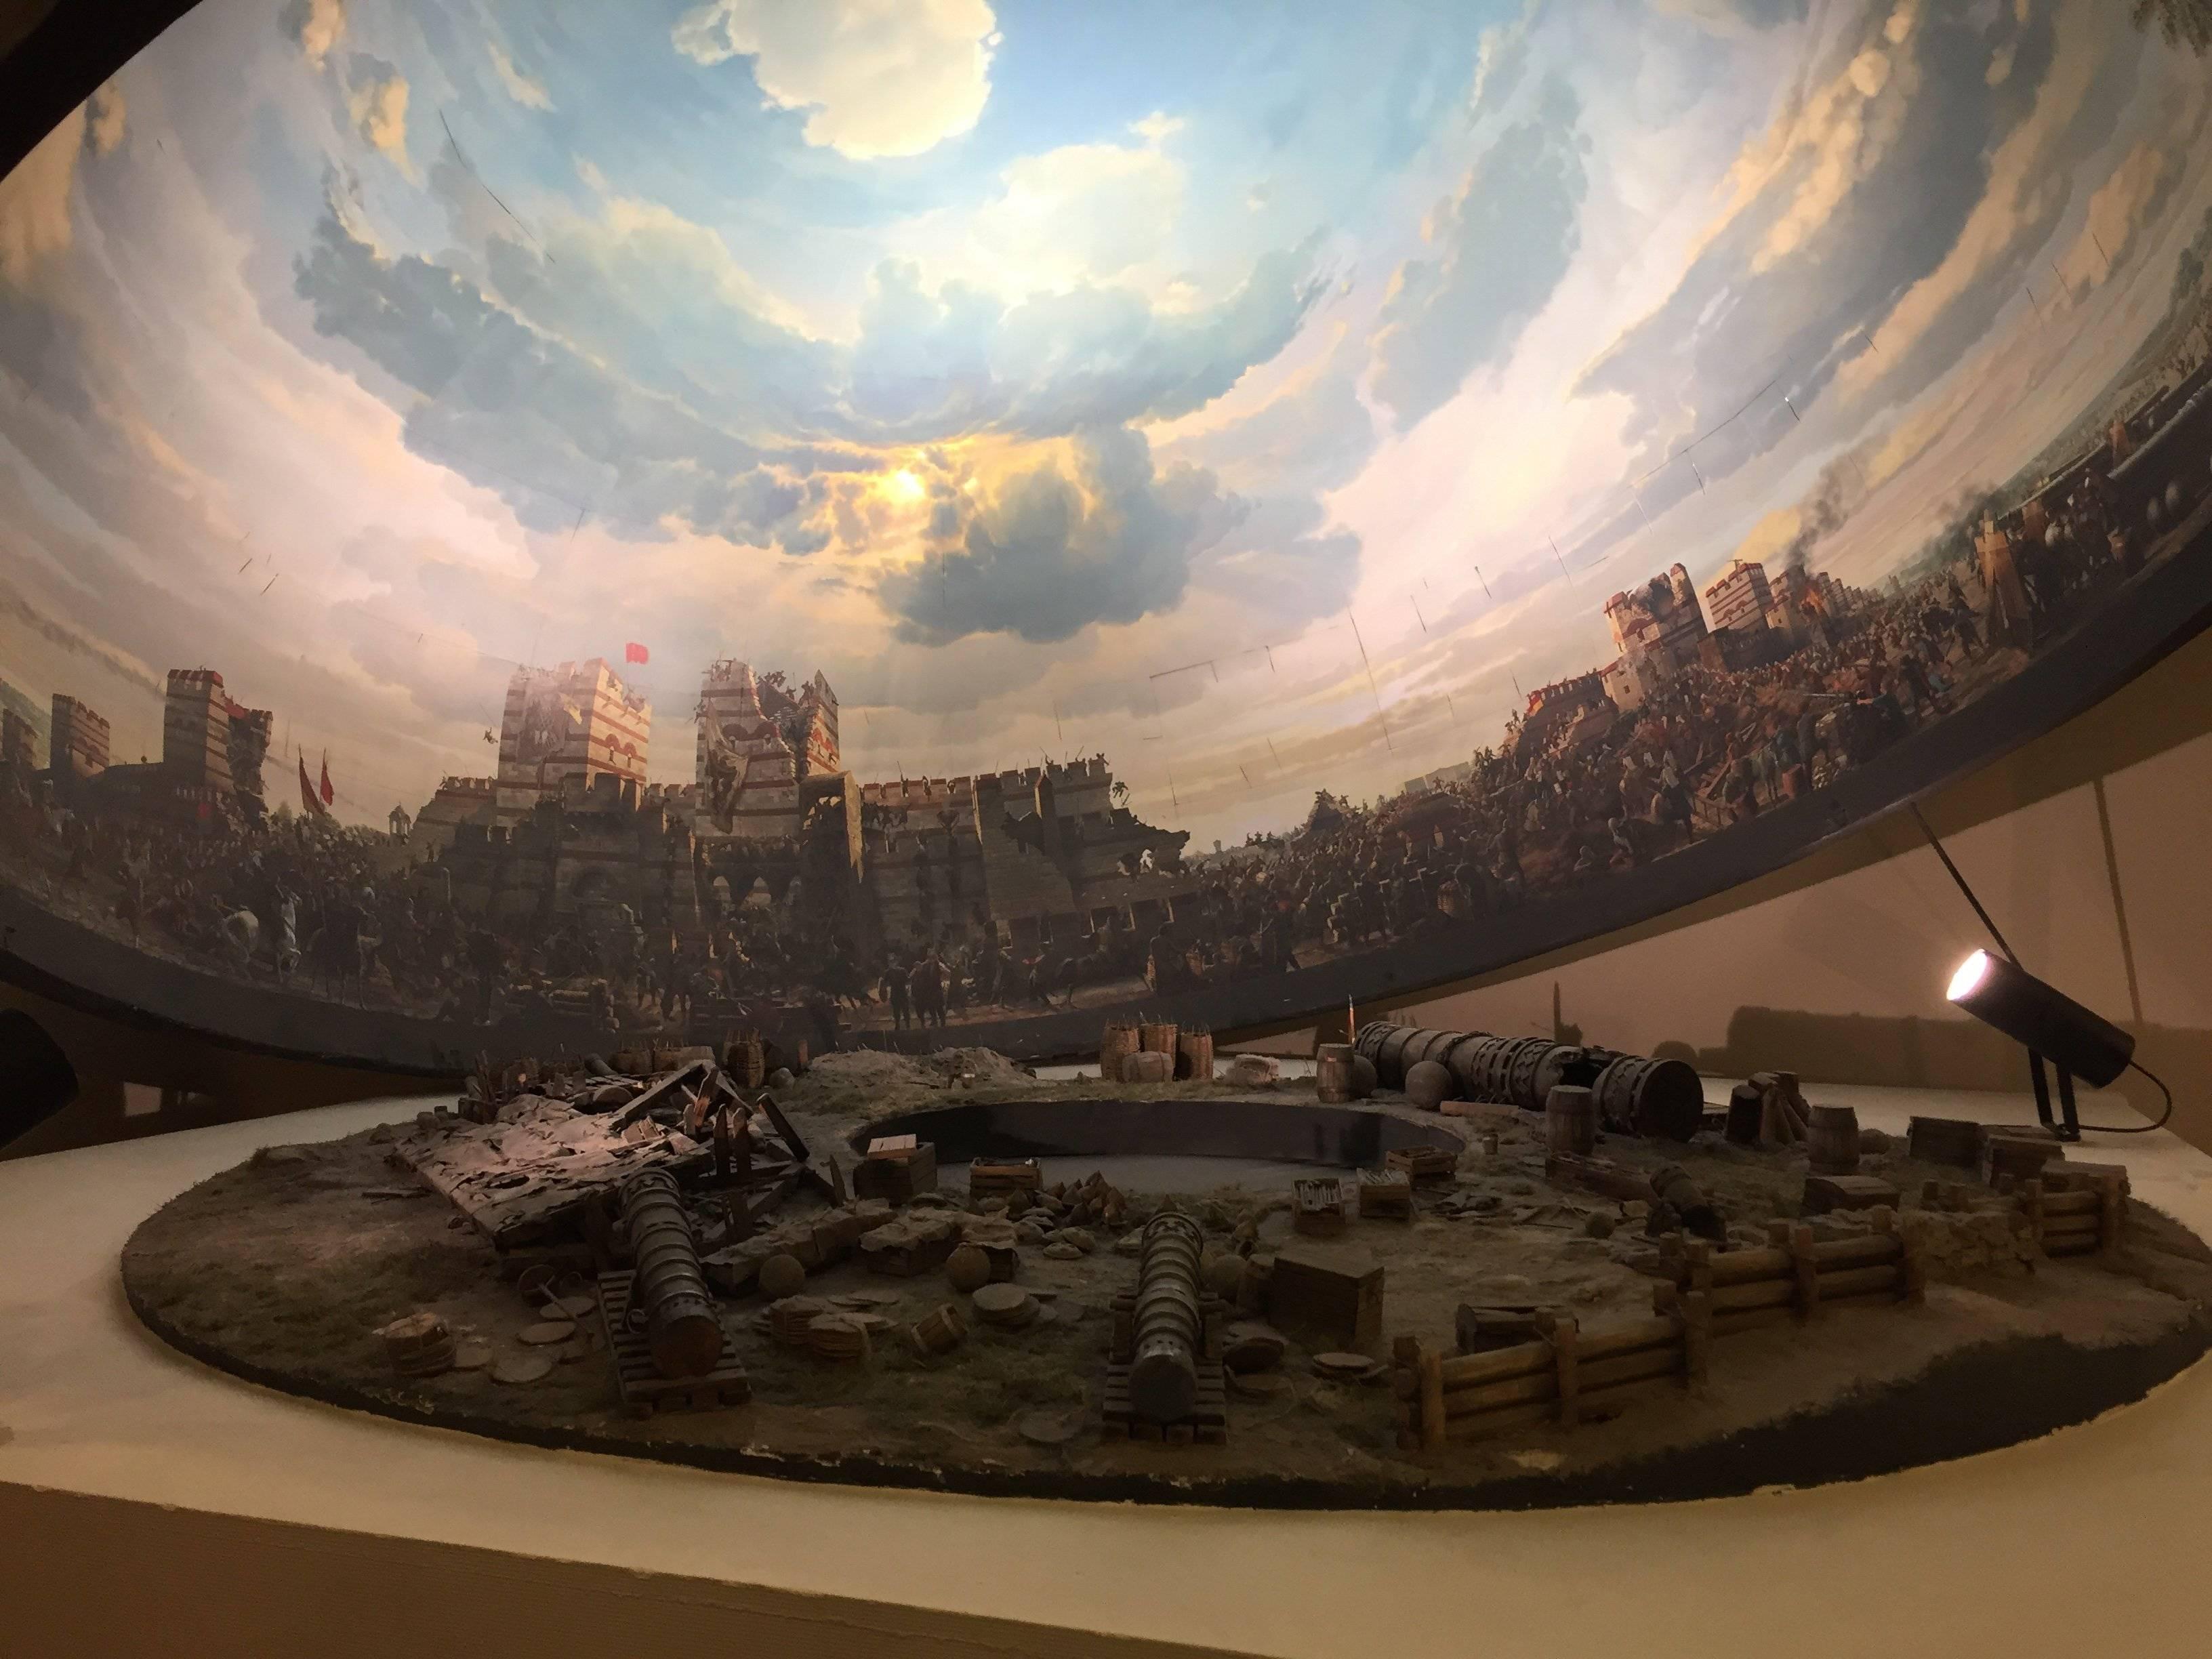 متحف بانوراما 1453